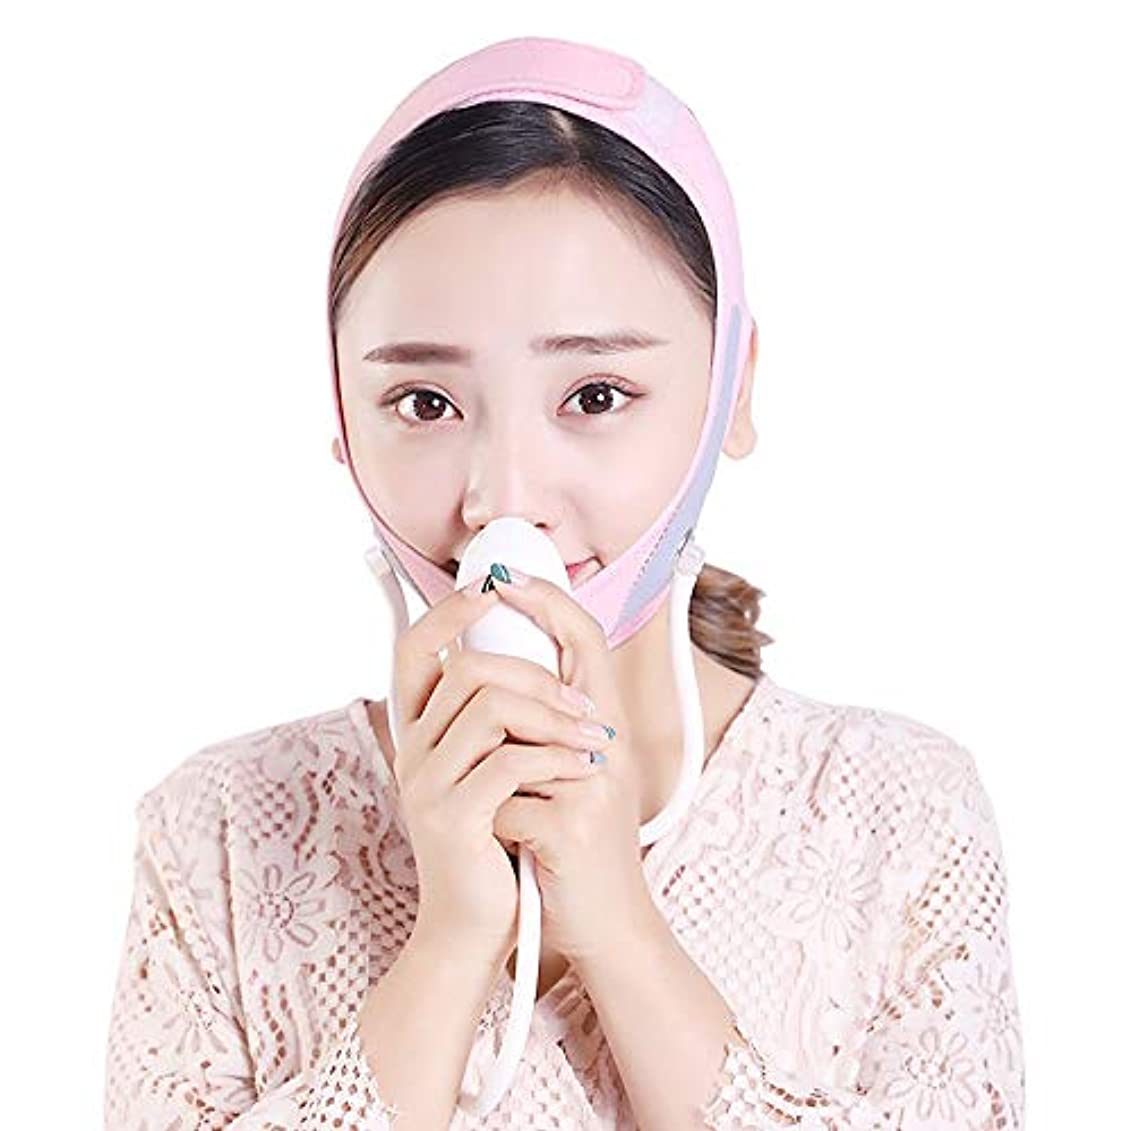 Minmin インフレータブル調節可能なフェイスリフトアーチファクト包帯をダブルチンリフト引き締めカラスの足one骨のサイズV顔ユニセックス - ピンク みんみんVラインフェイスマスク